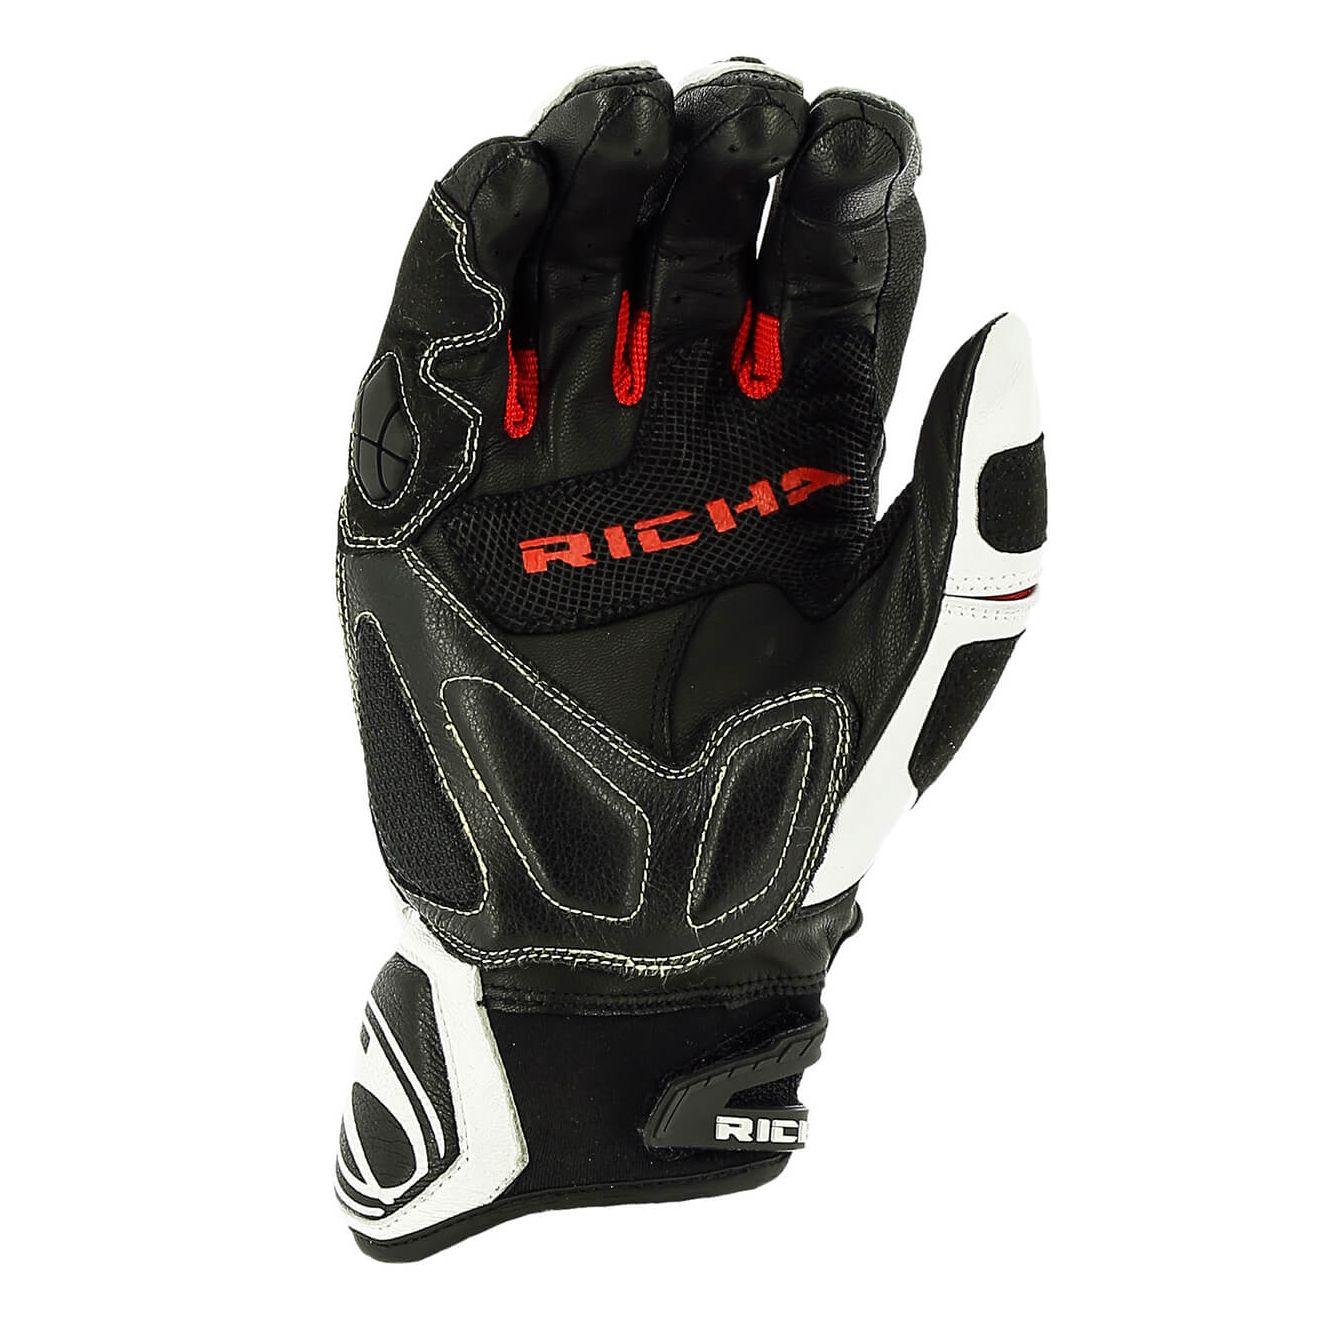 gants richa stealth black white black white red gants moto. Black Bedroom Furniture Sets. Home Design Ideas